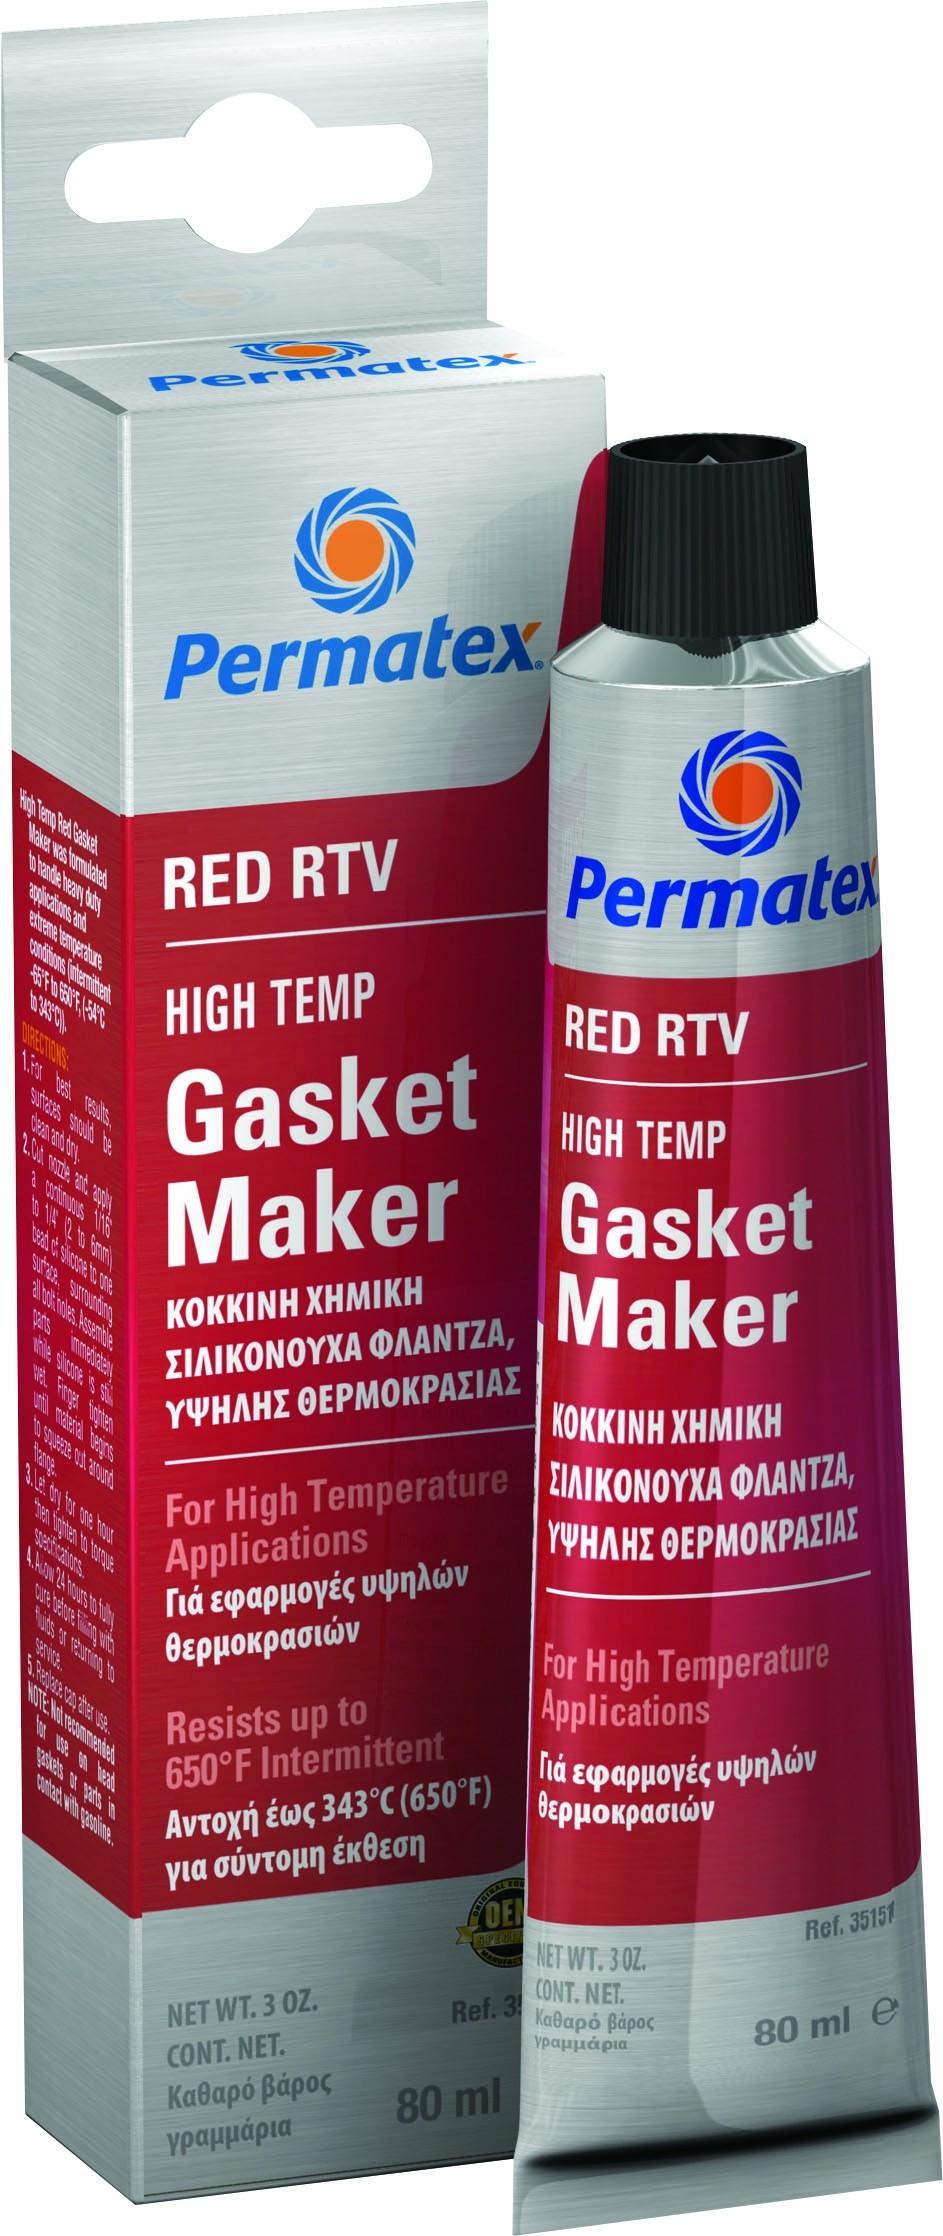 Permatex HI-Temp Red RTV Silicone Gasket 80ml